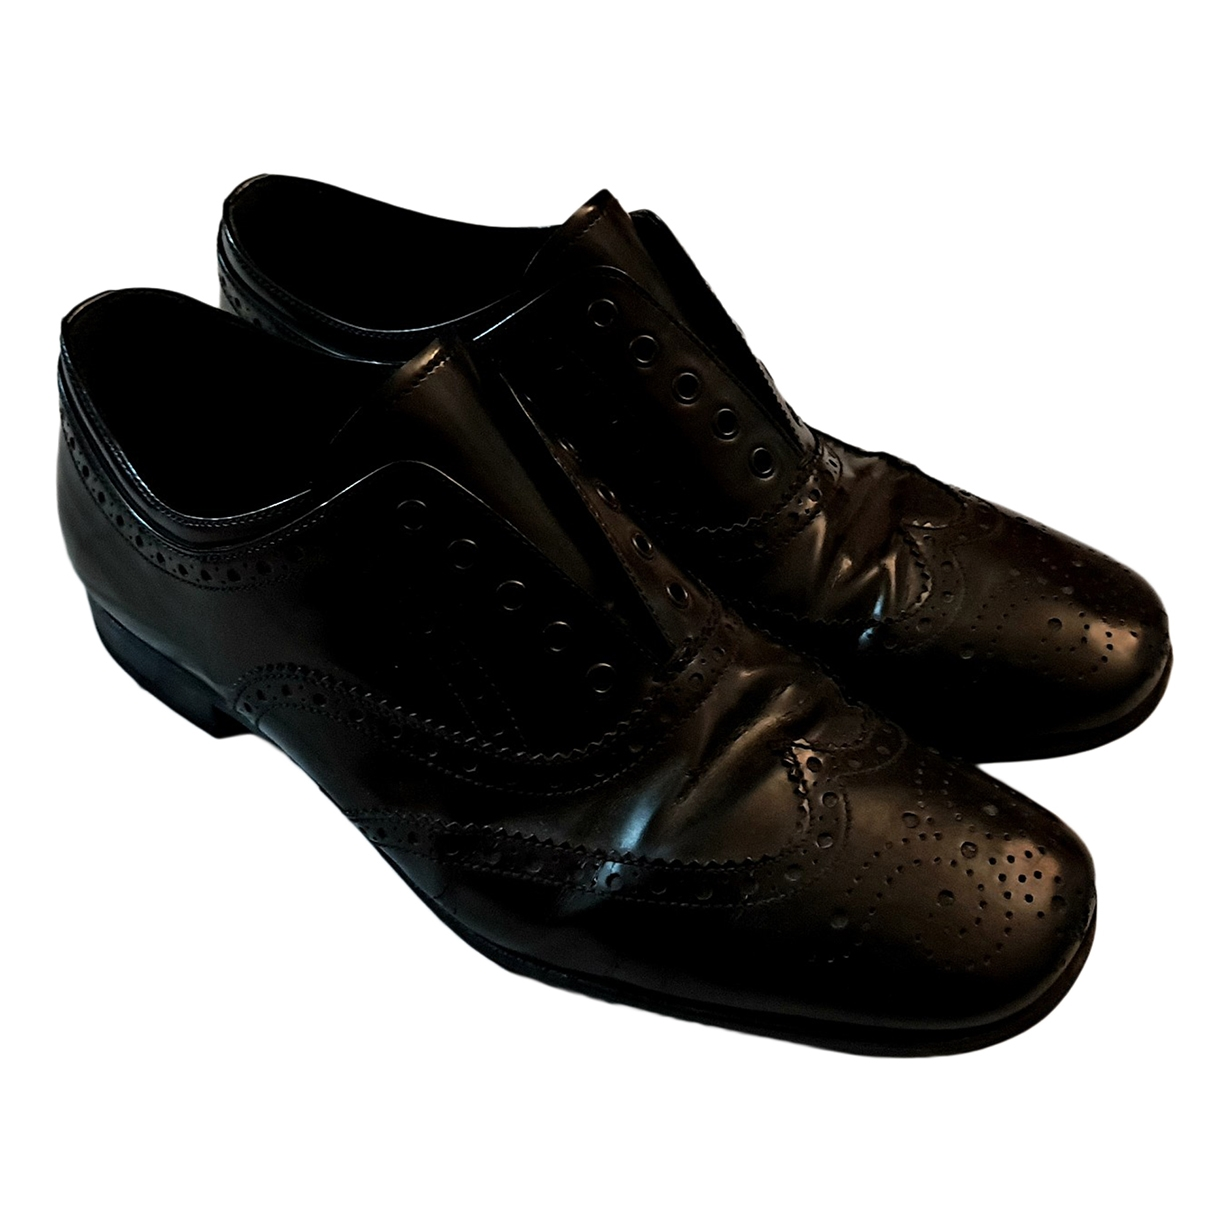 Prada - Derbies   pour homme en cuir - noir